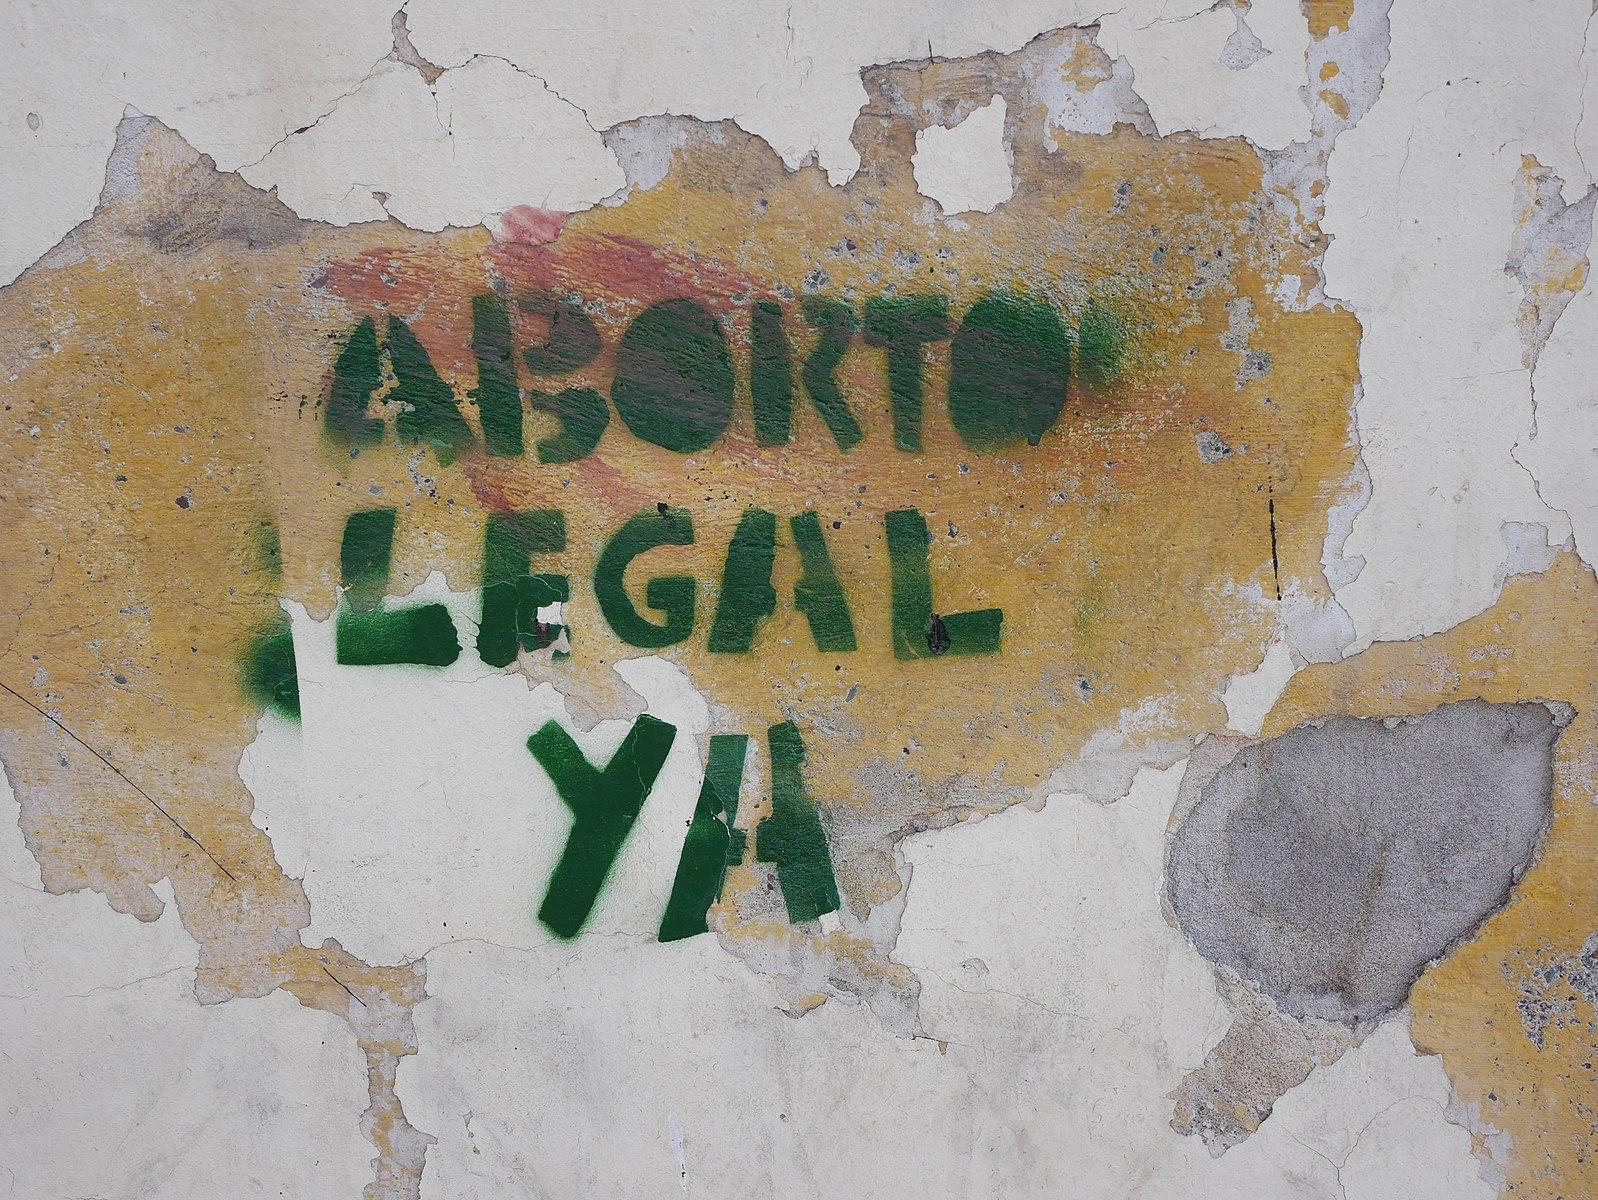 graffiti on an argentinian building